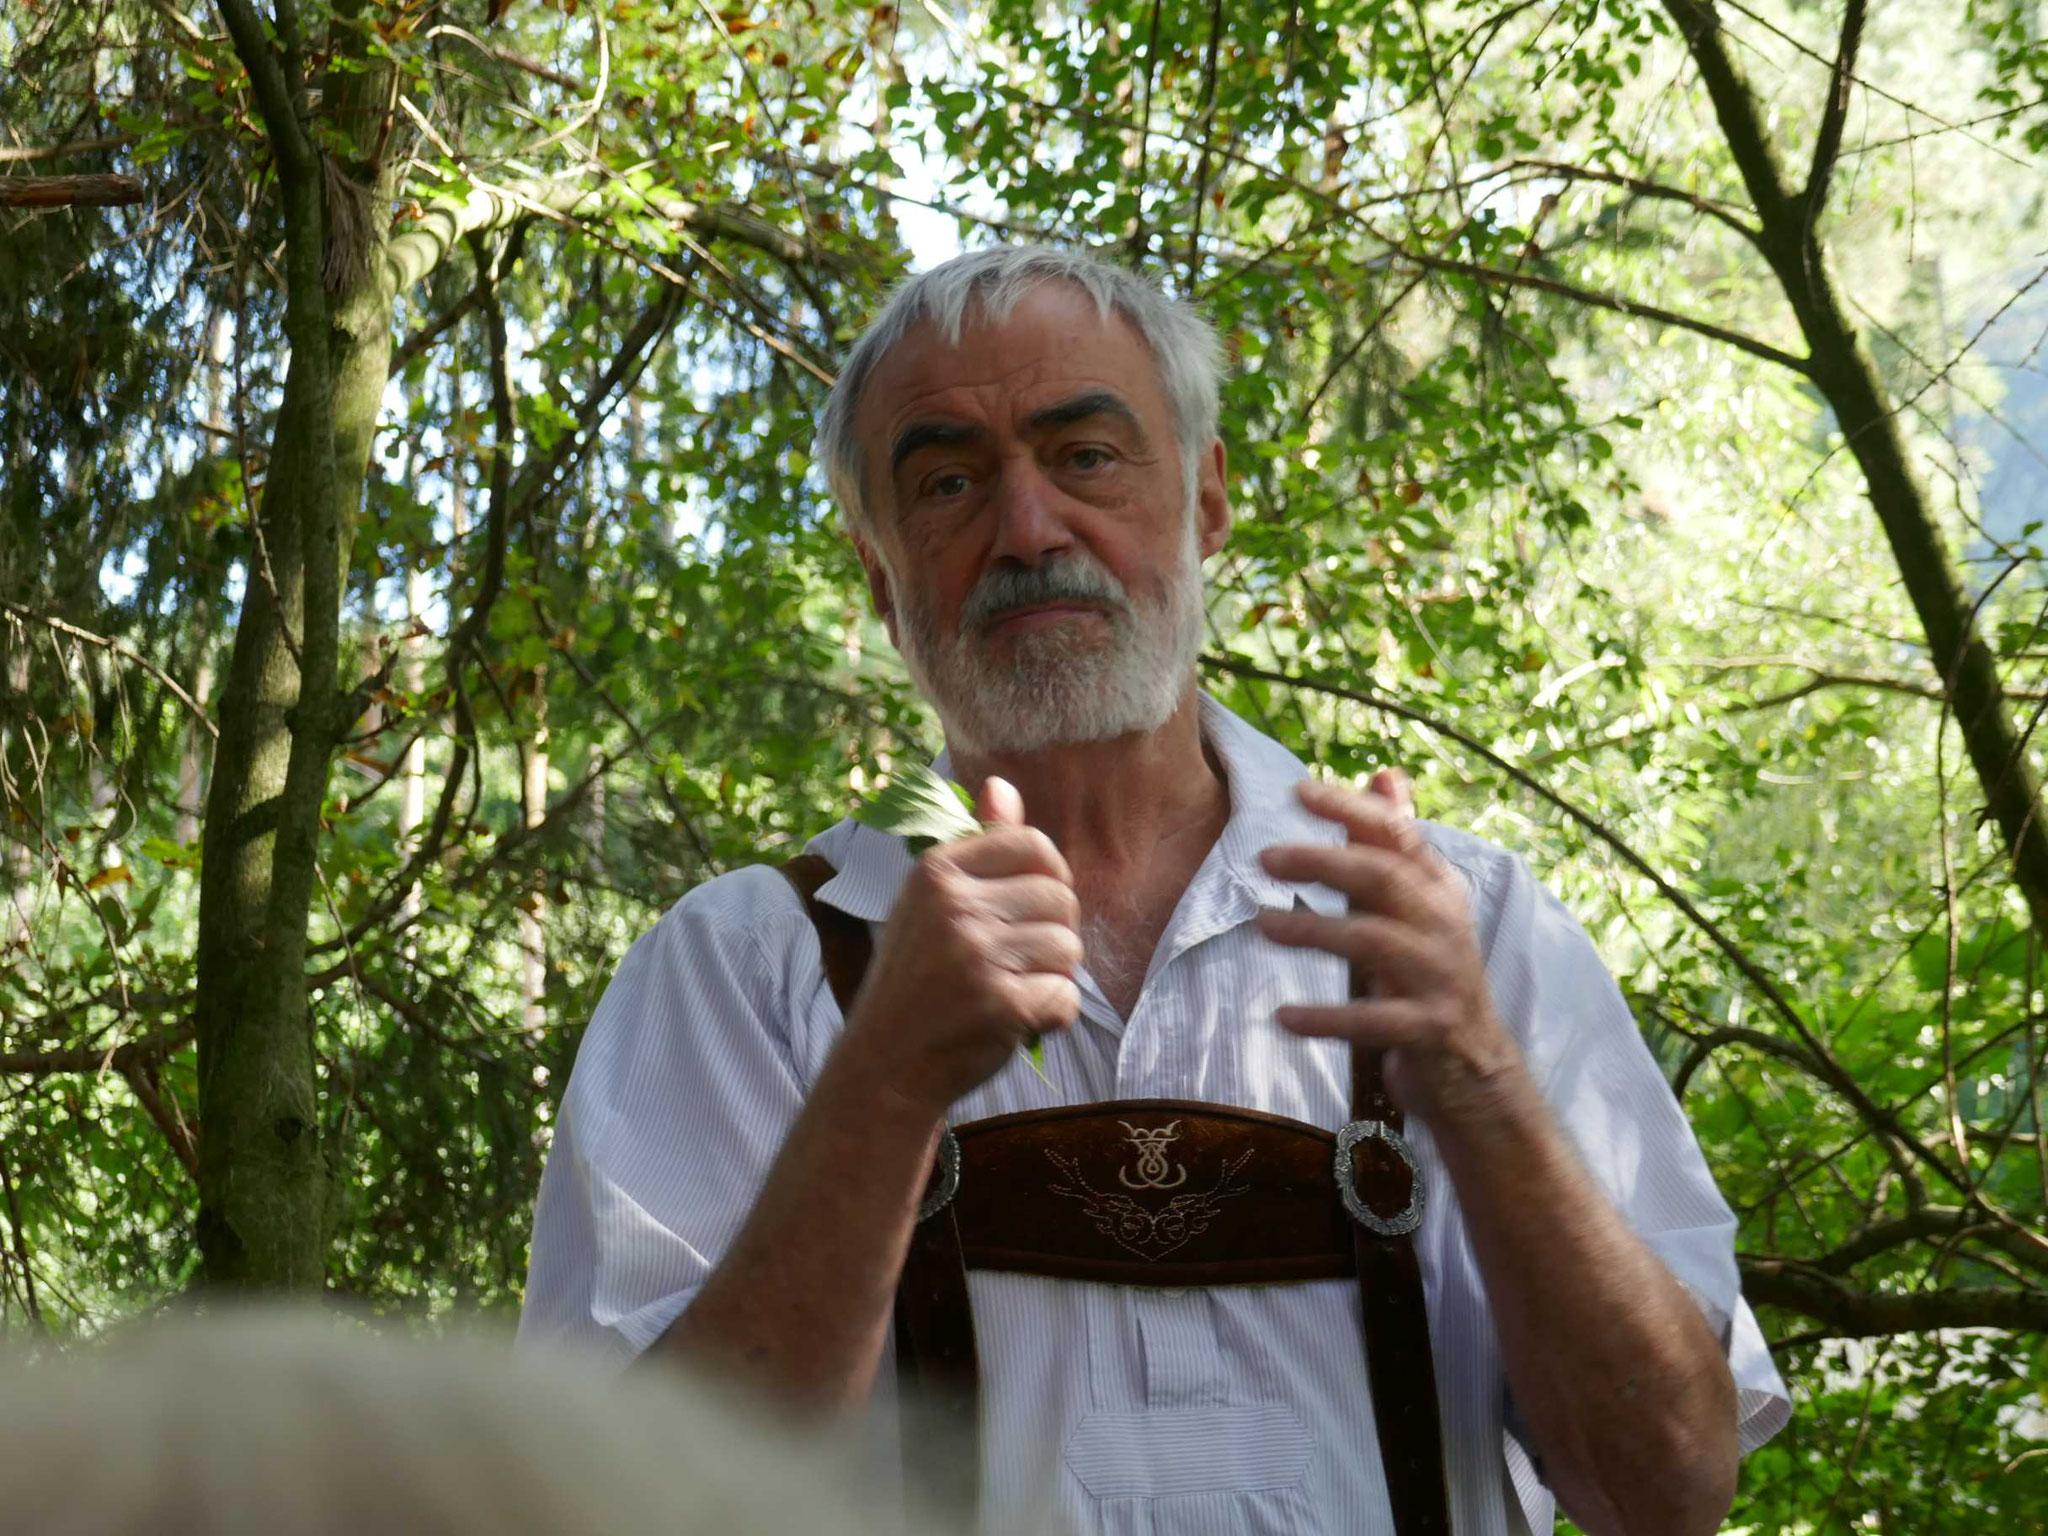 Steinschaler Naturgarten-Führung mit Johann Weiß